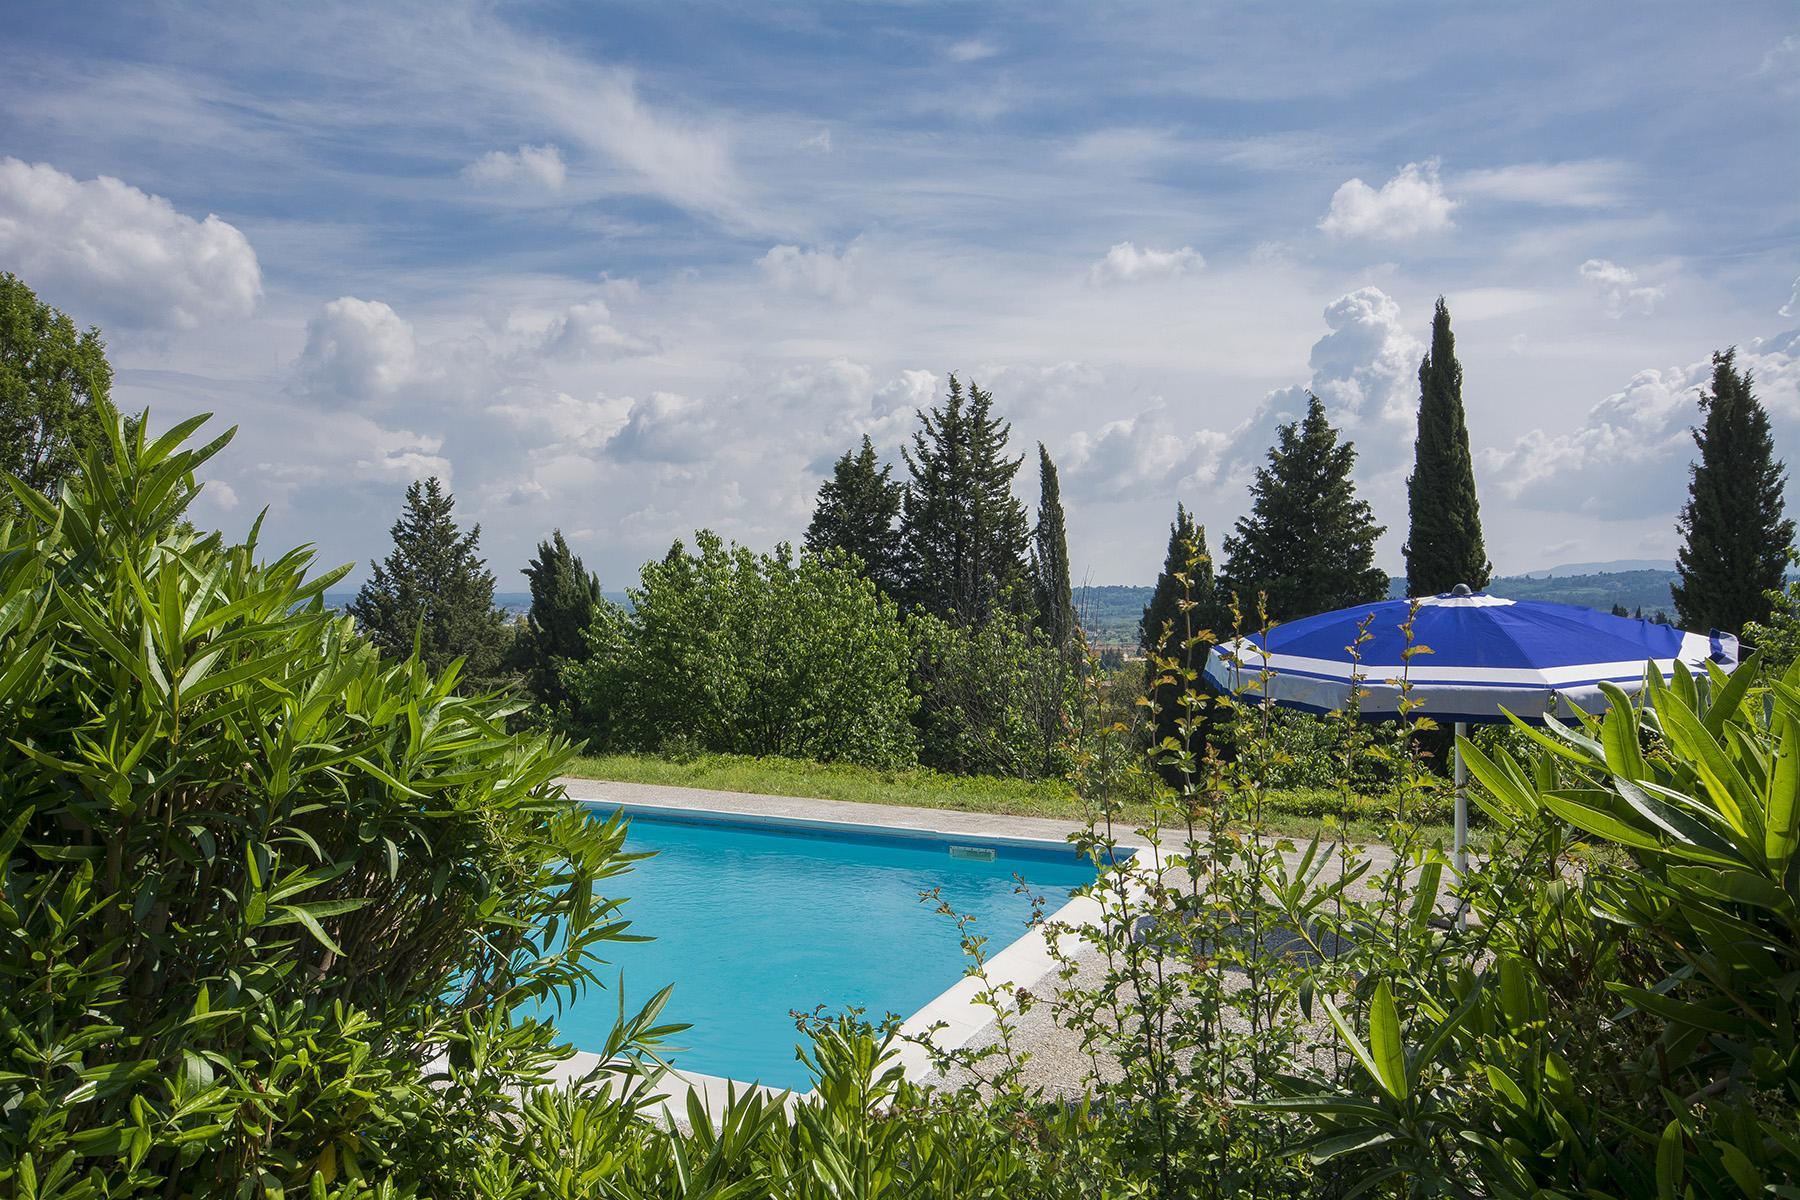 Pescia小山丘上美丽的乡间农舍 - 48